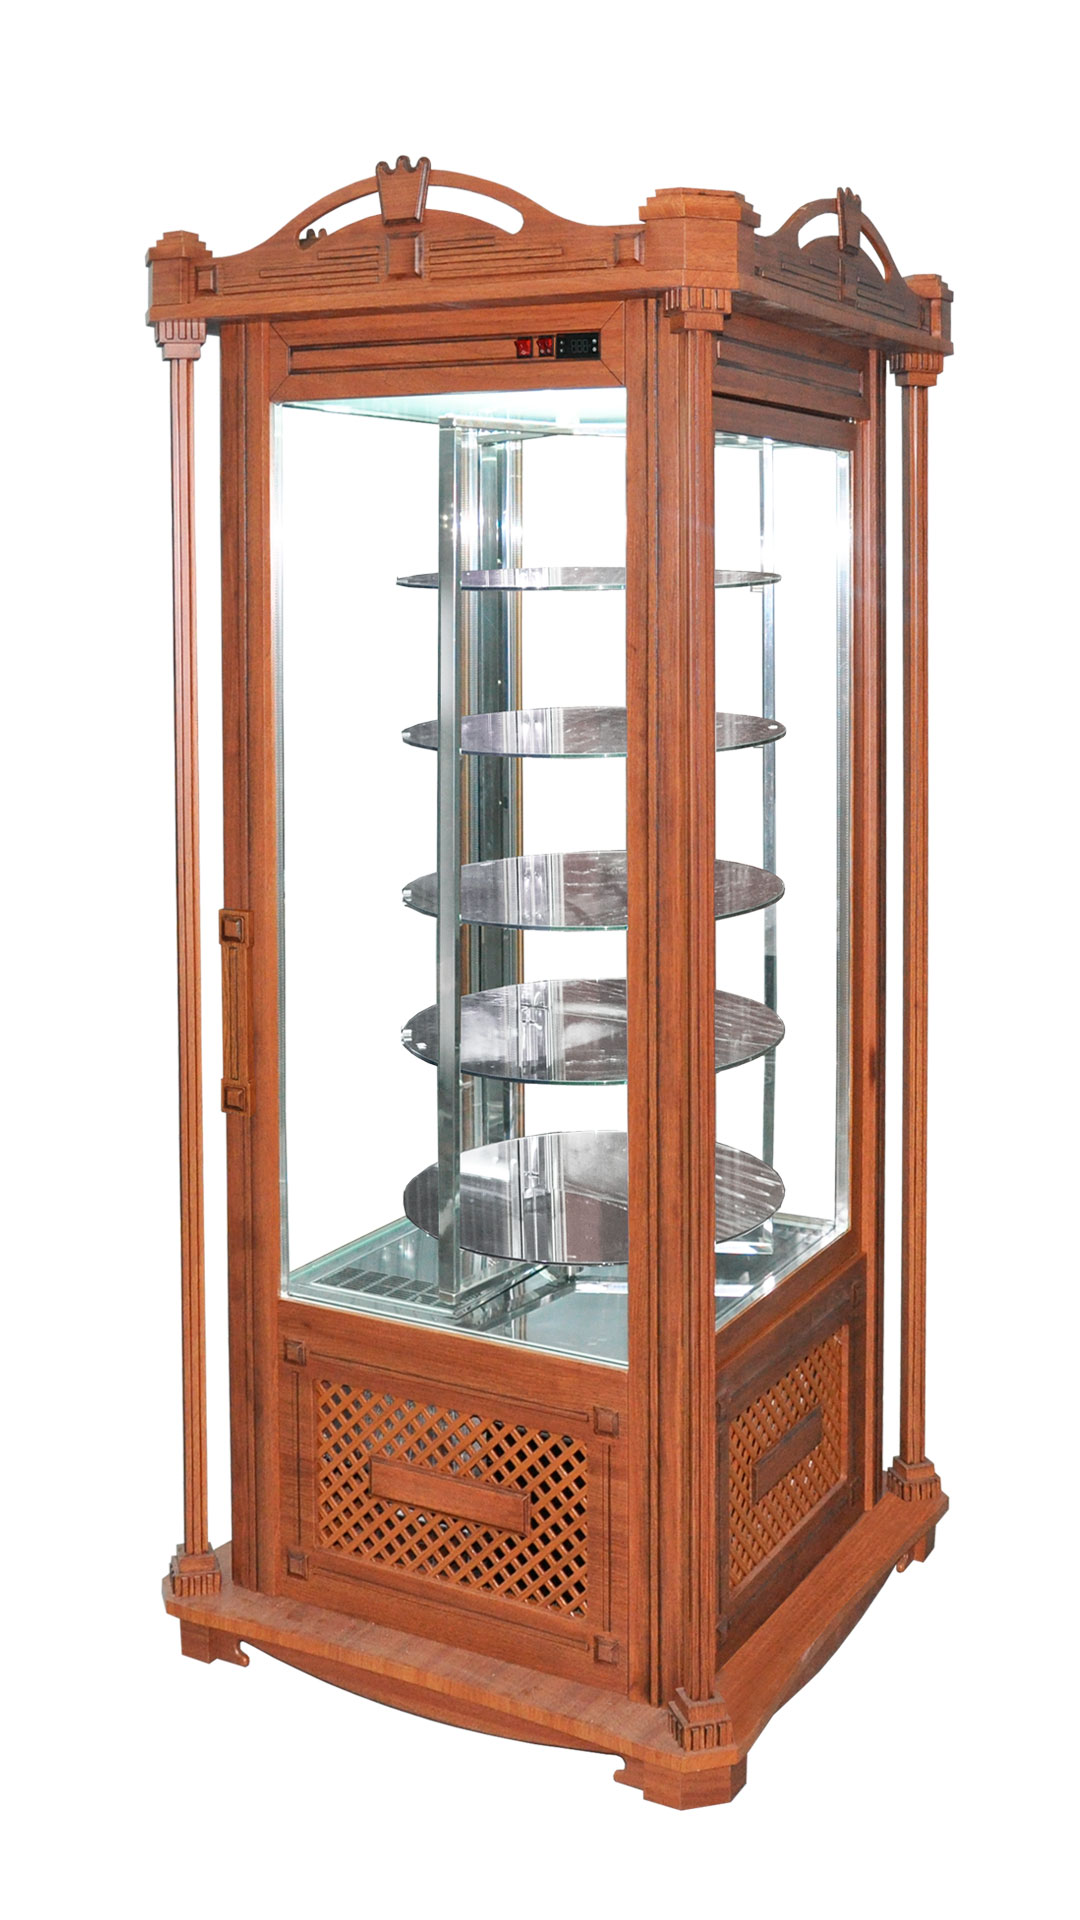 Кондитерский шкаф Kansas А4SG 070 patisserie 1HD 198-D600A-070